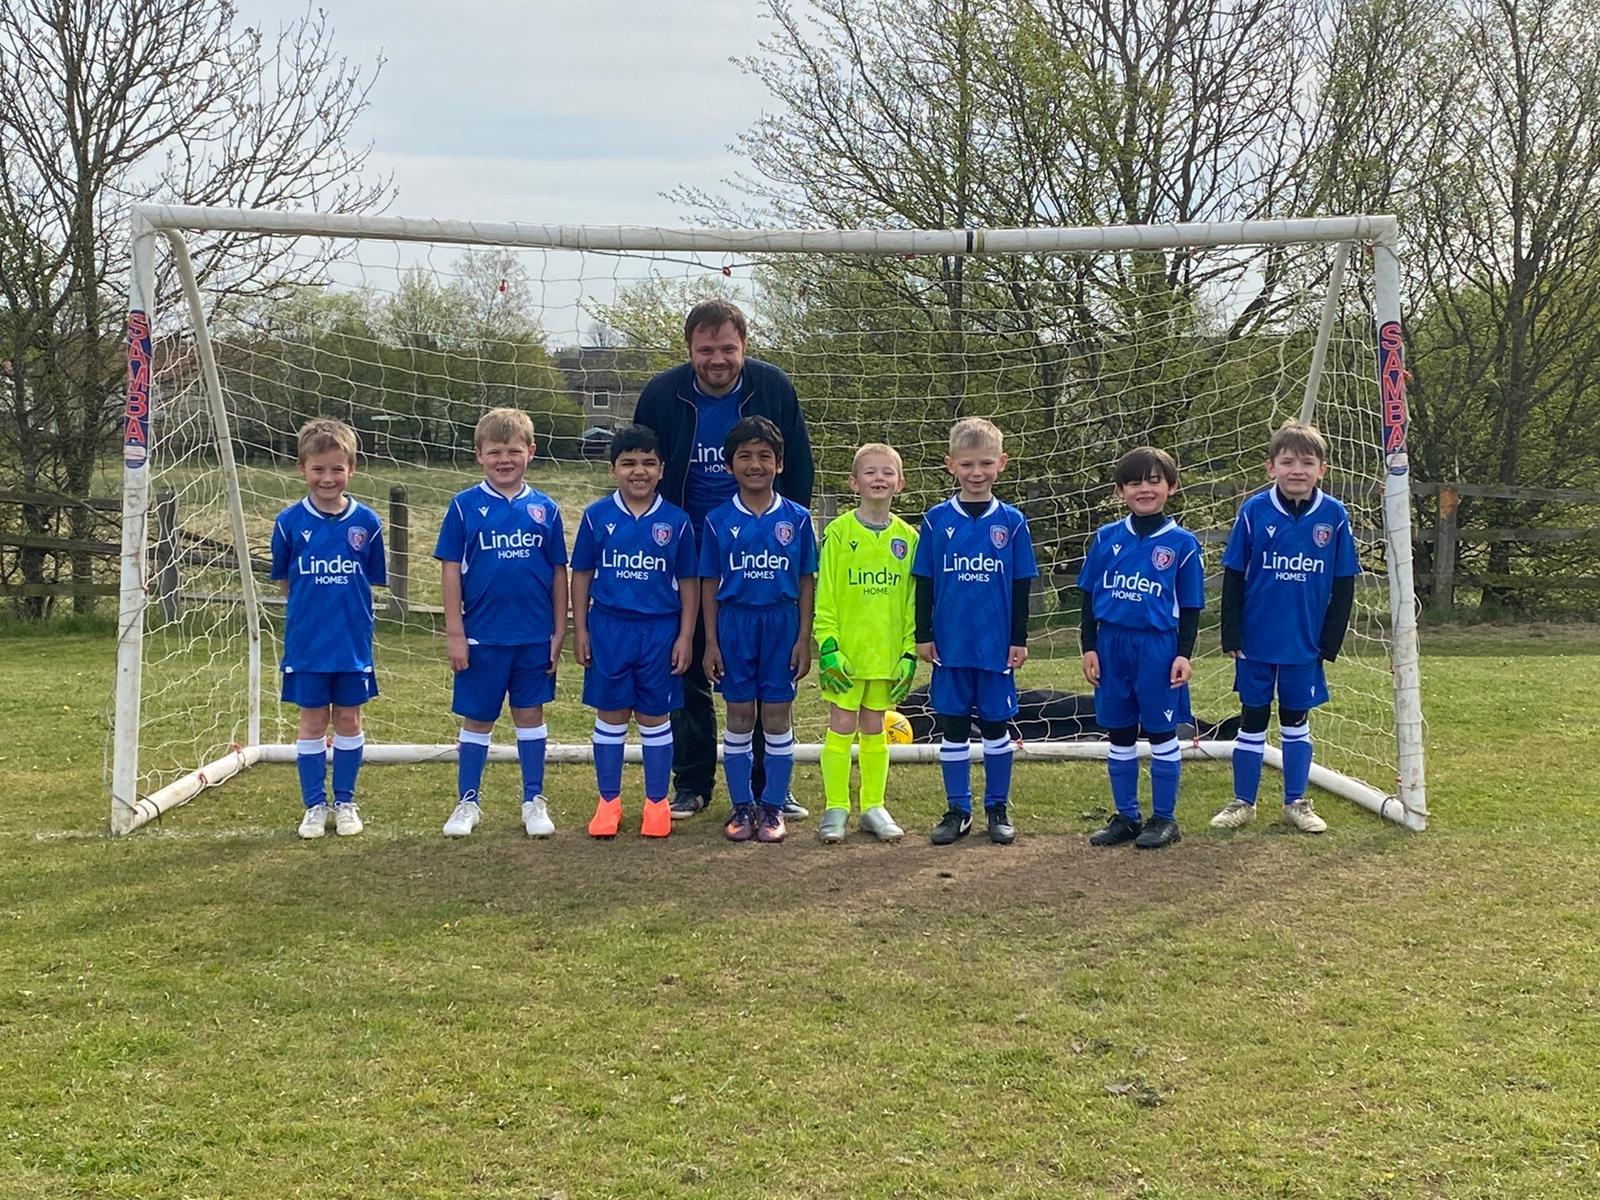 Linden Homes sponsor local football team